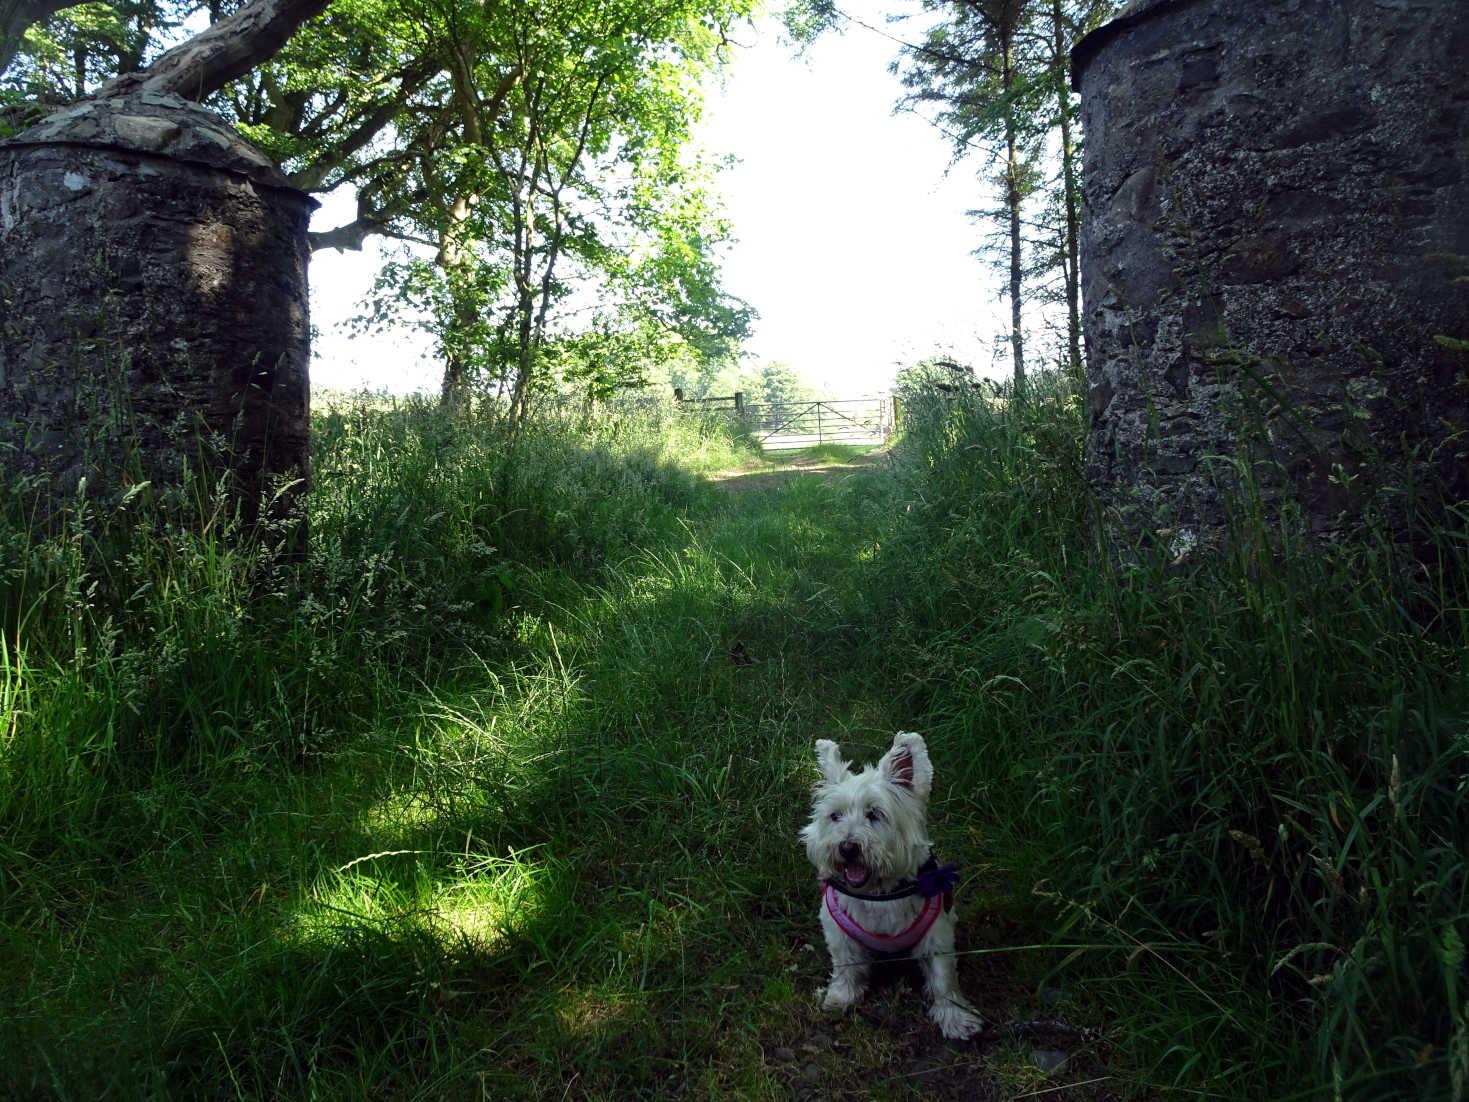 poppy the westie at old gates to dunskey estate portpatrick